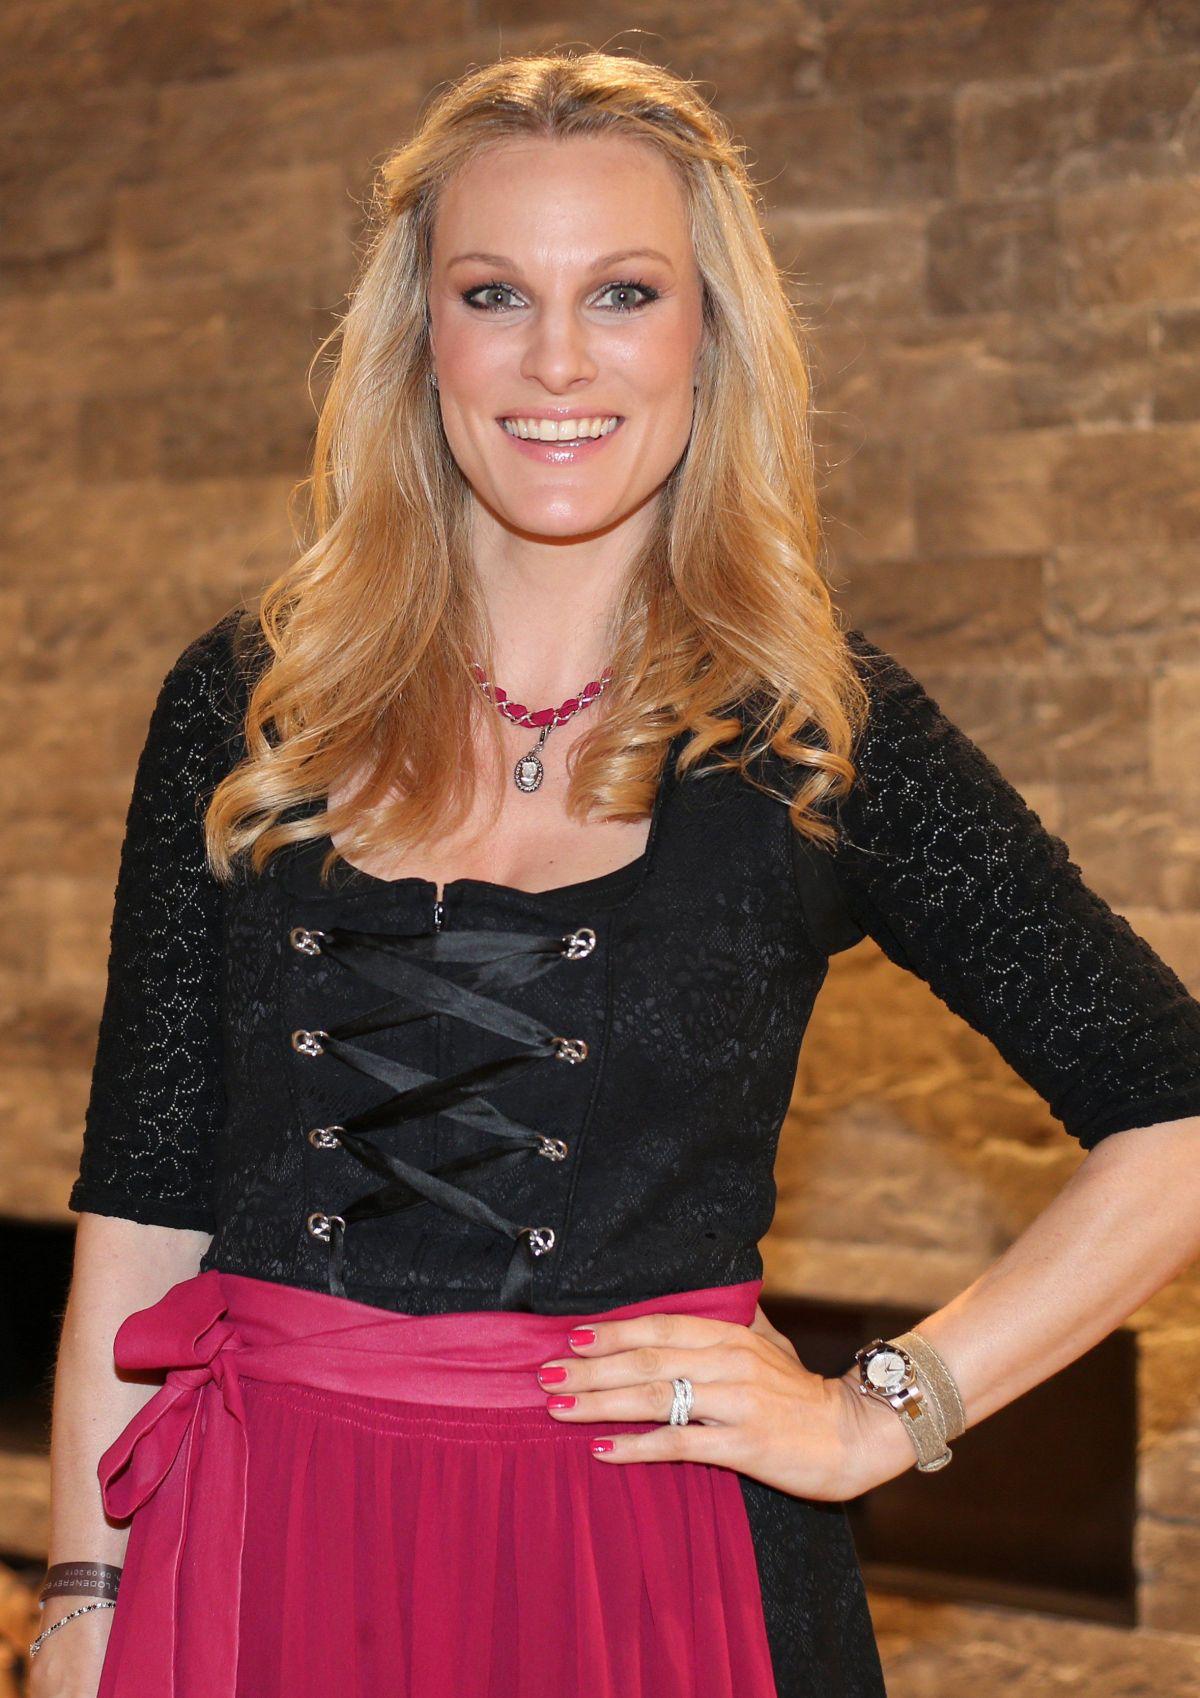 CHRISTINA SURER at Lodenfrey and Baume & Mercier Host Cocktail Reception in Munchen 09/09/2015